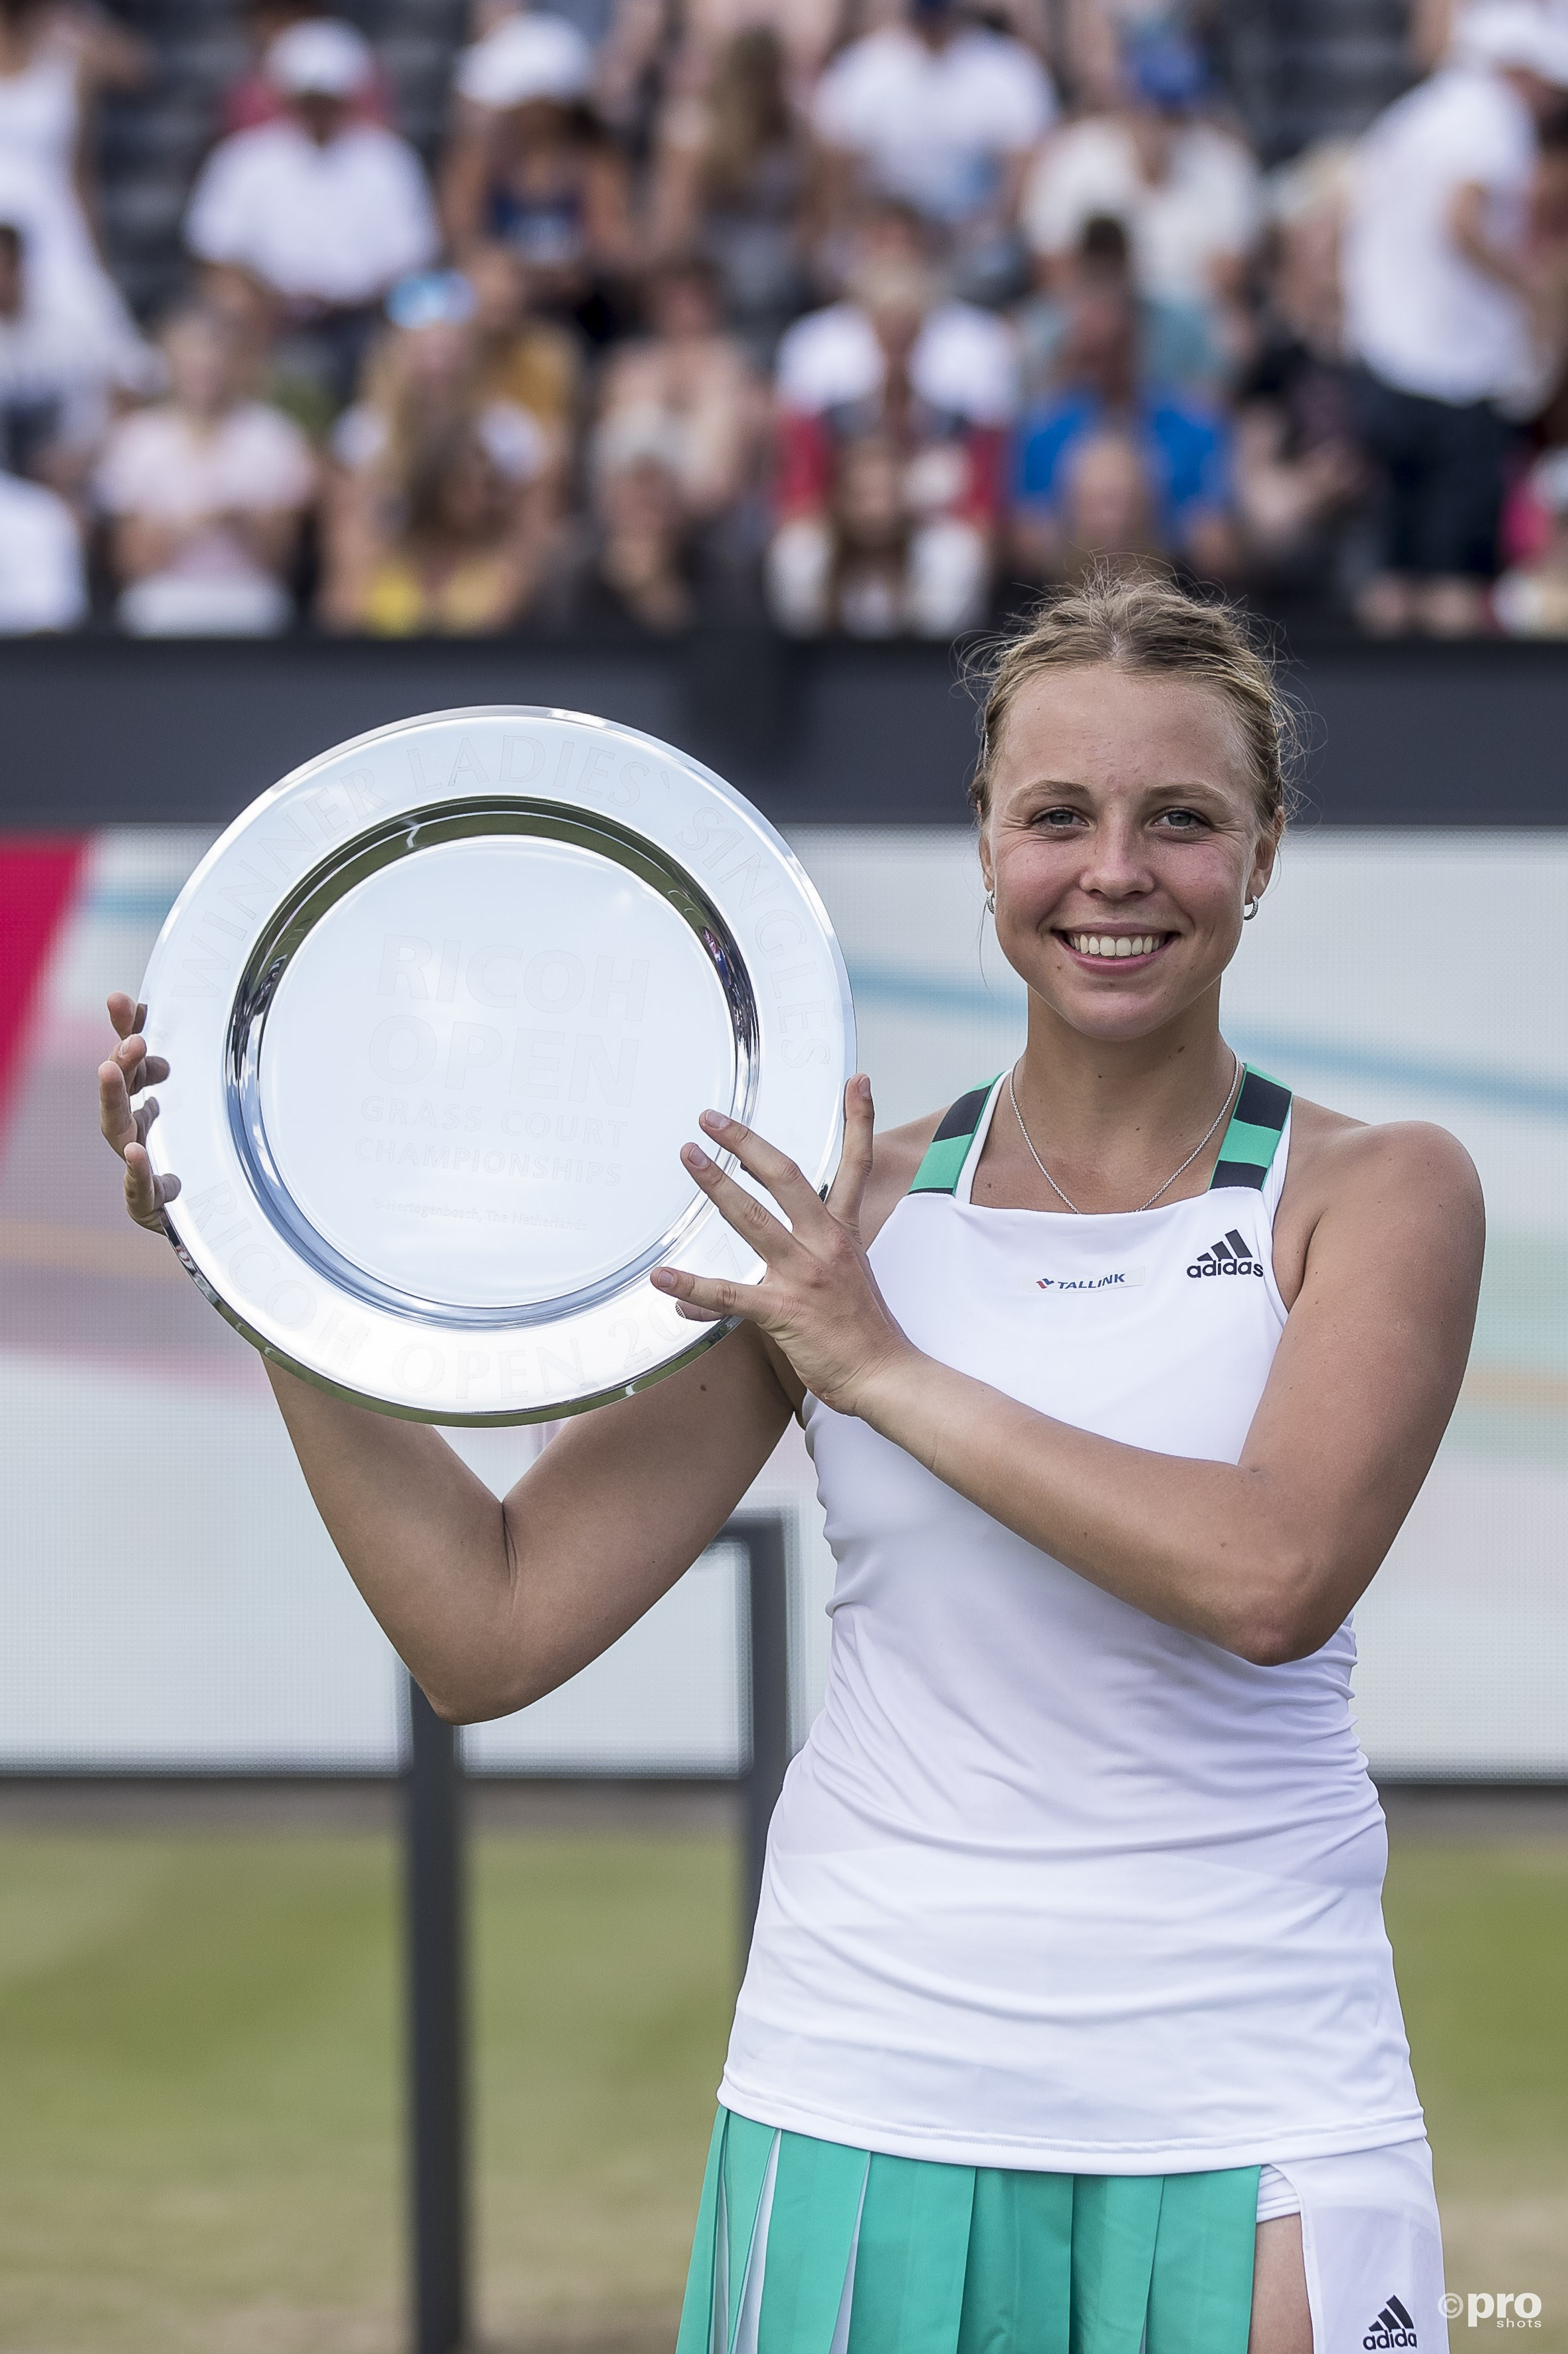 Kontaveit pakt eerste WTA-titel in Rosmalen. (PRO SHOTS/Joep Leenen)